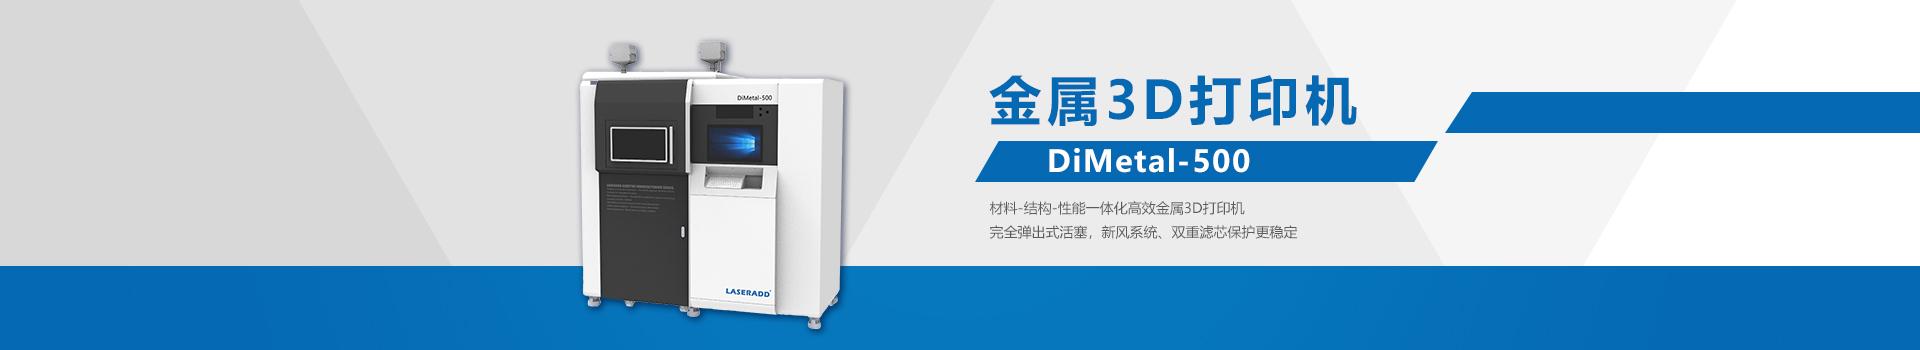 DiMetal-500 太阳集团2007网站